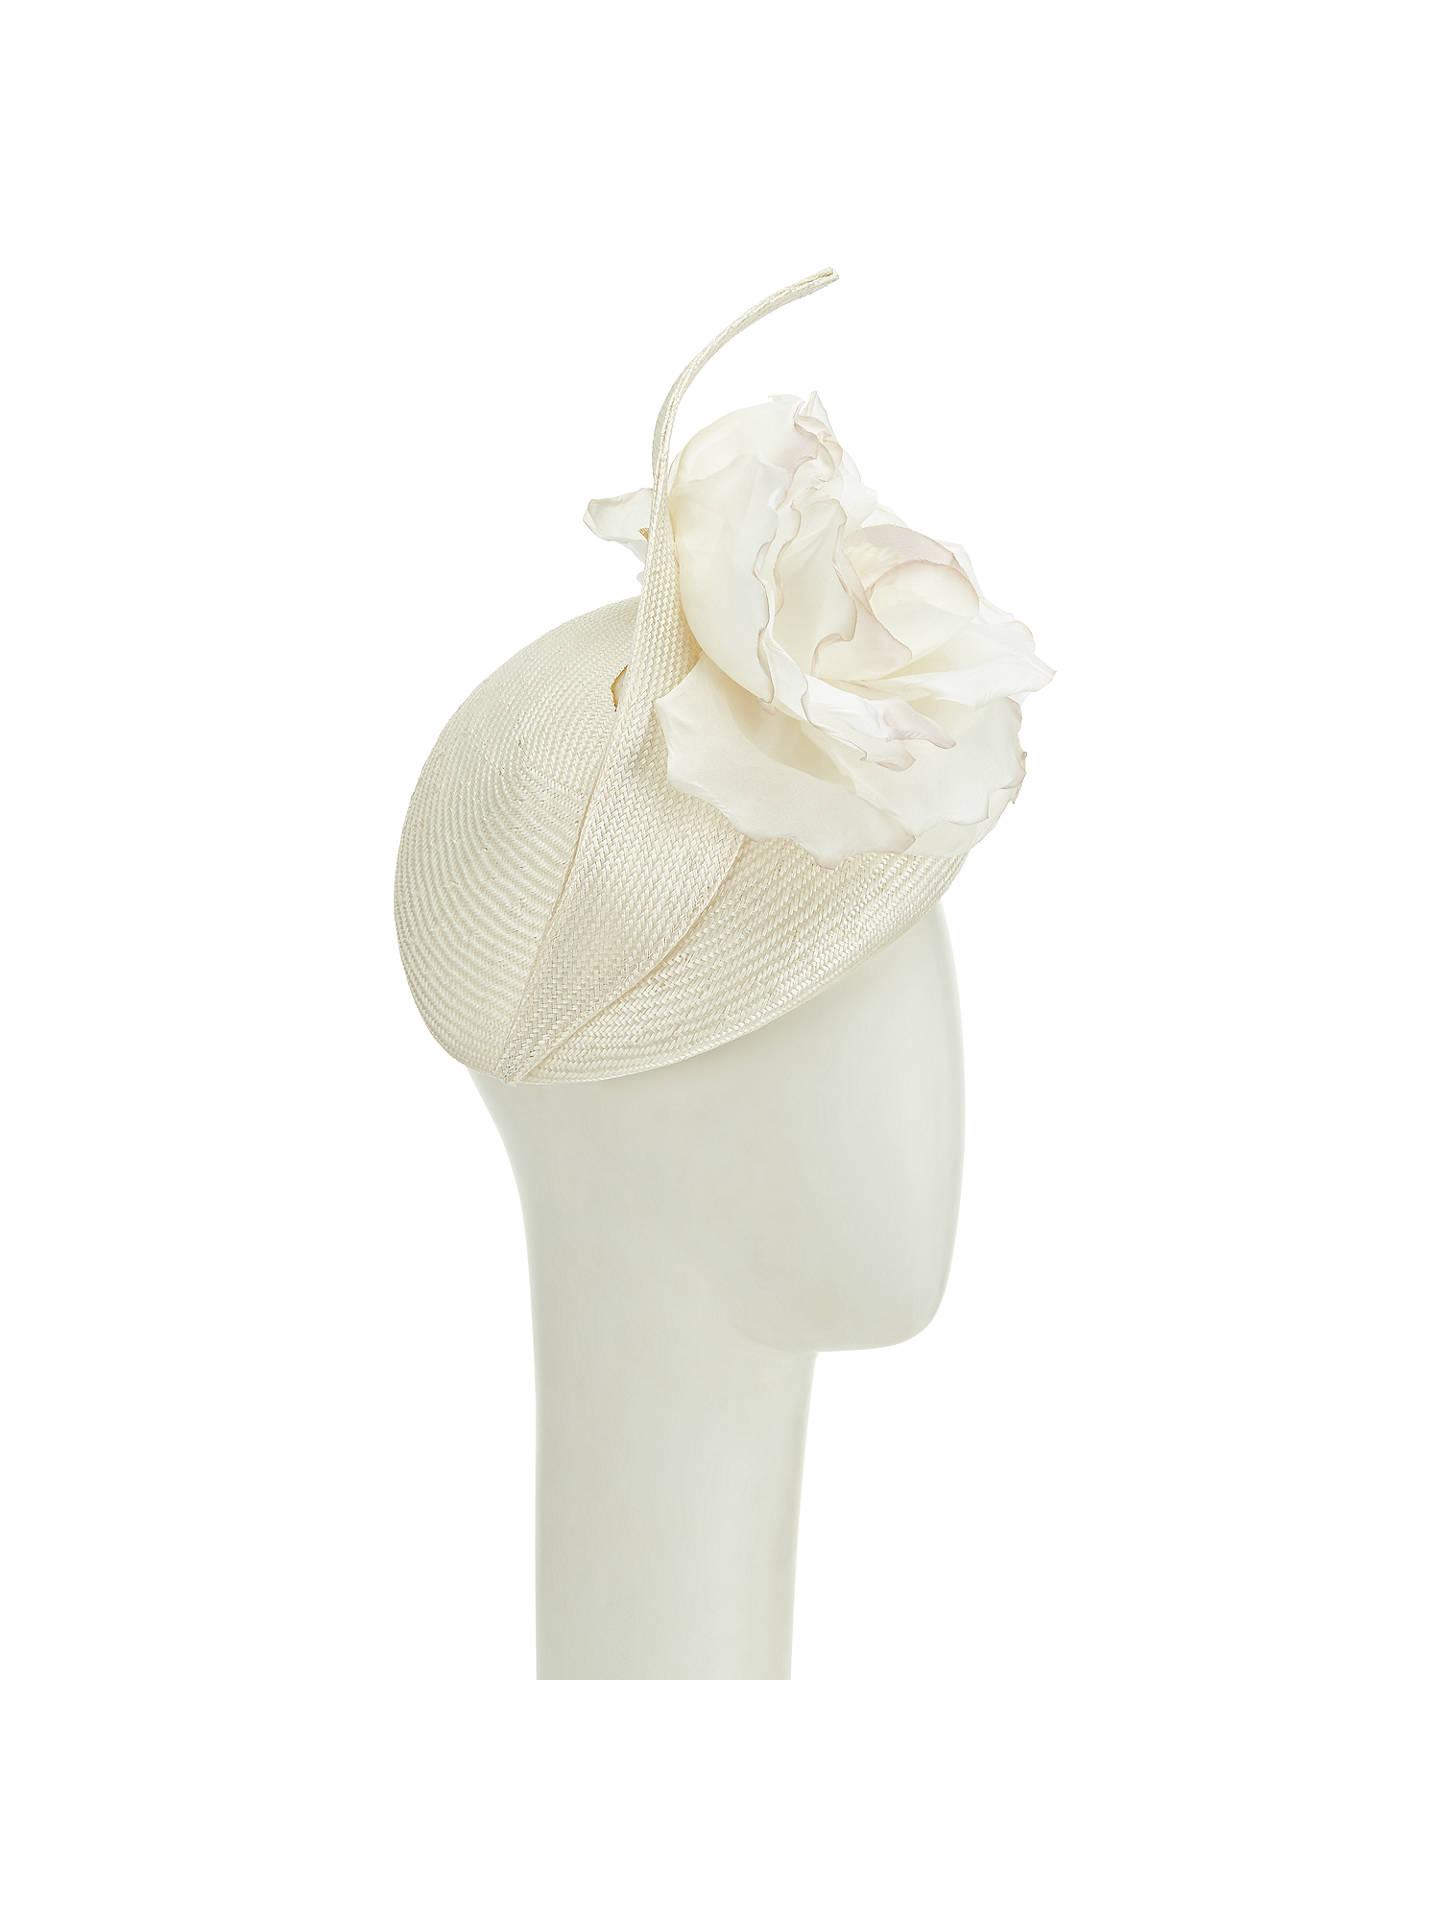 6cdf50db64e BuyWhiteley Faye Pillbox Occasion Hat